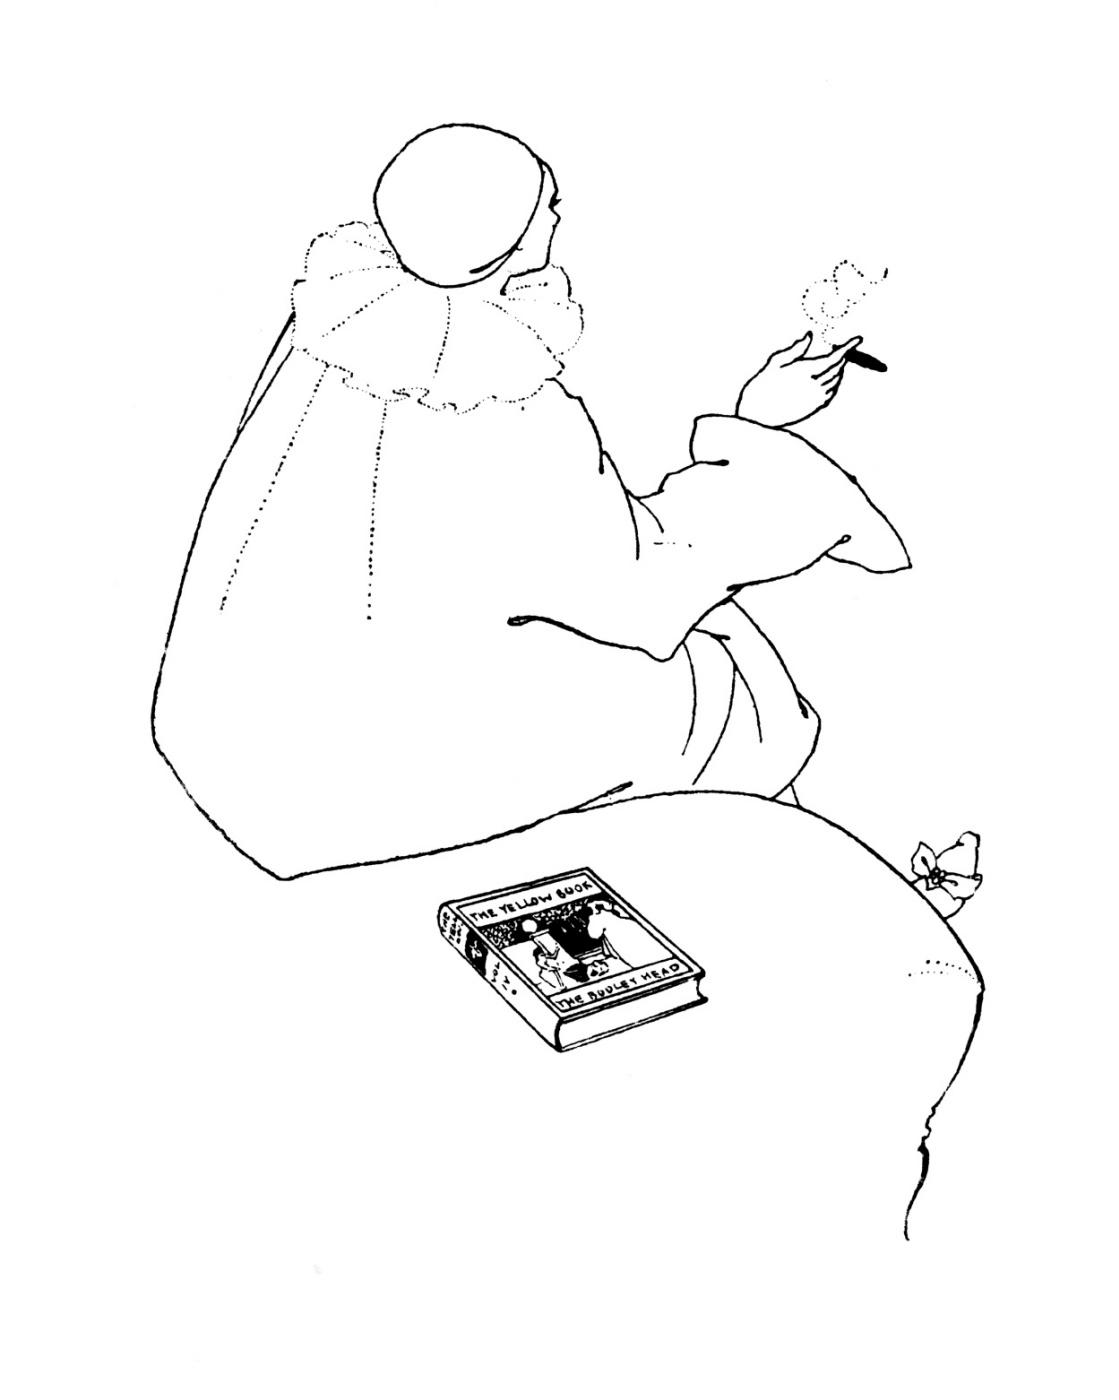 Aubrey Beardsley. The Yellow Book Magazine